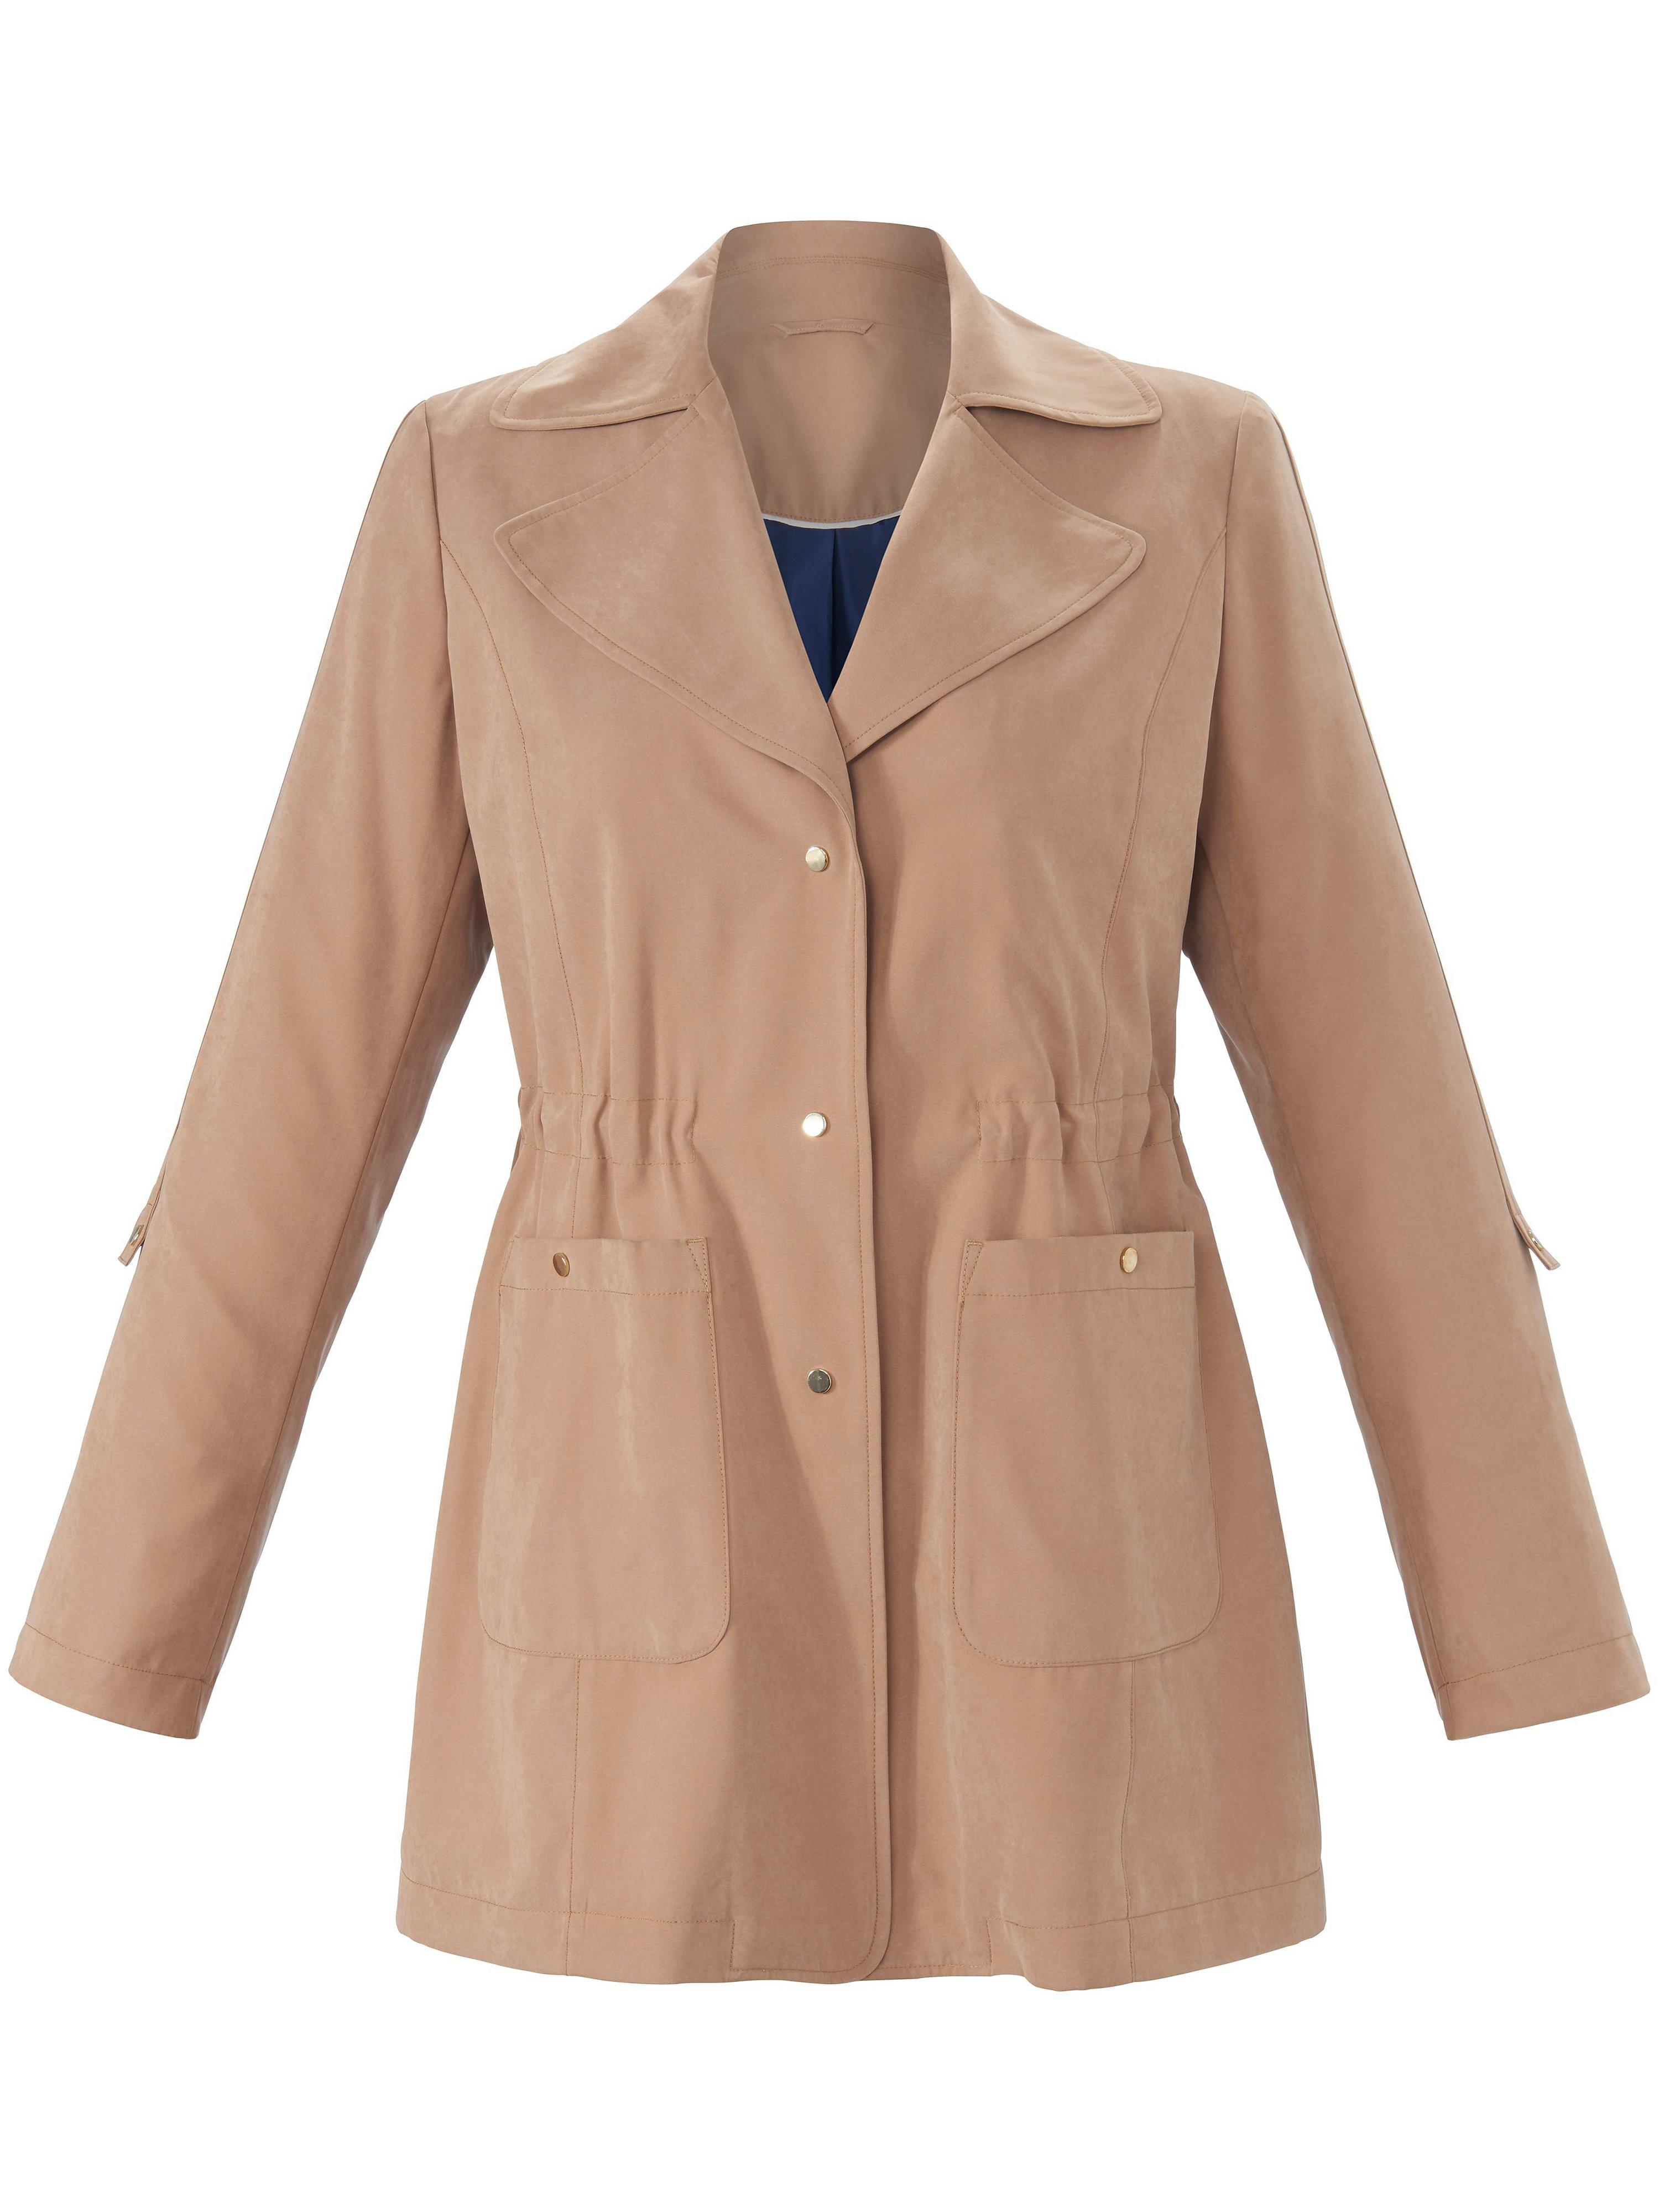 Outdoor jacket reversible collar Anna Aura beige